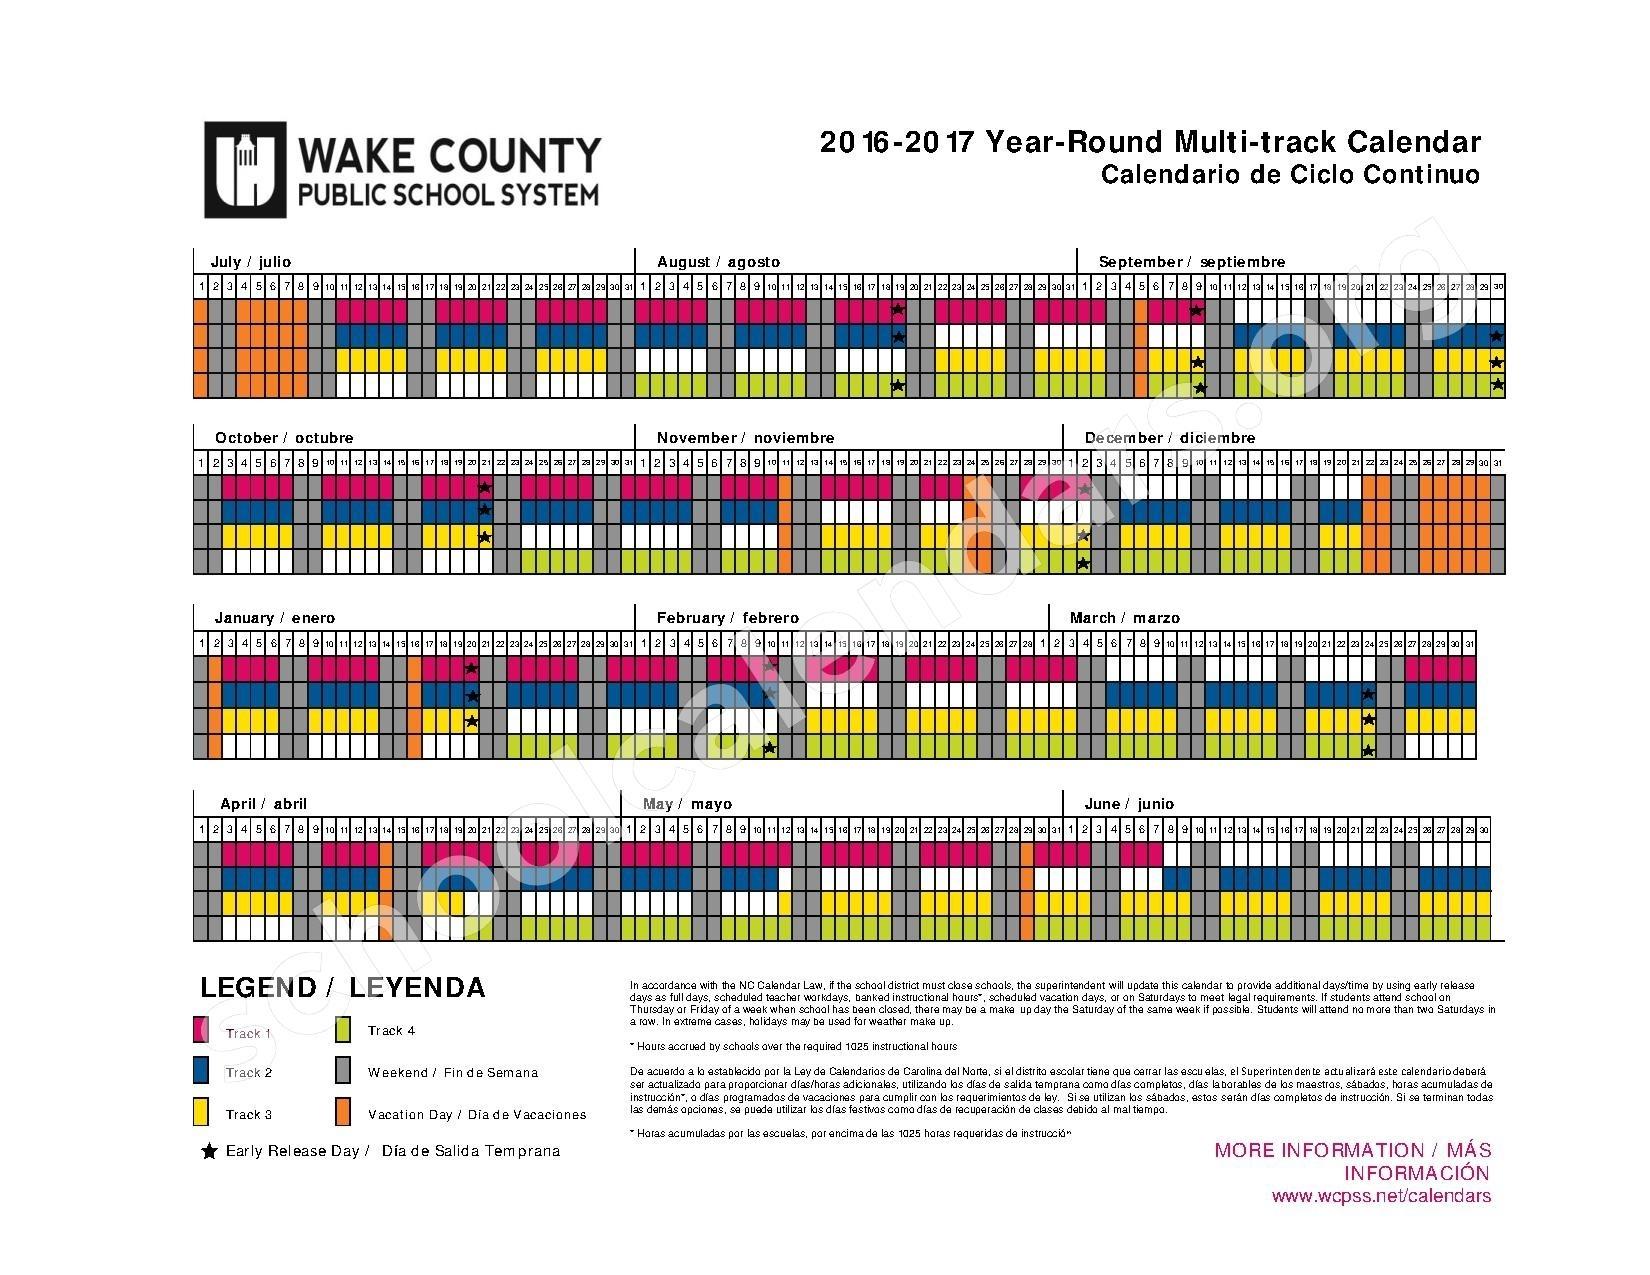 2016 2017 Wake County Year Round Calendar Calendar Template 2017